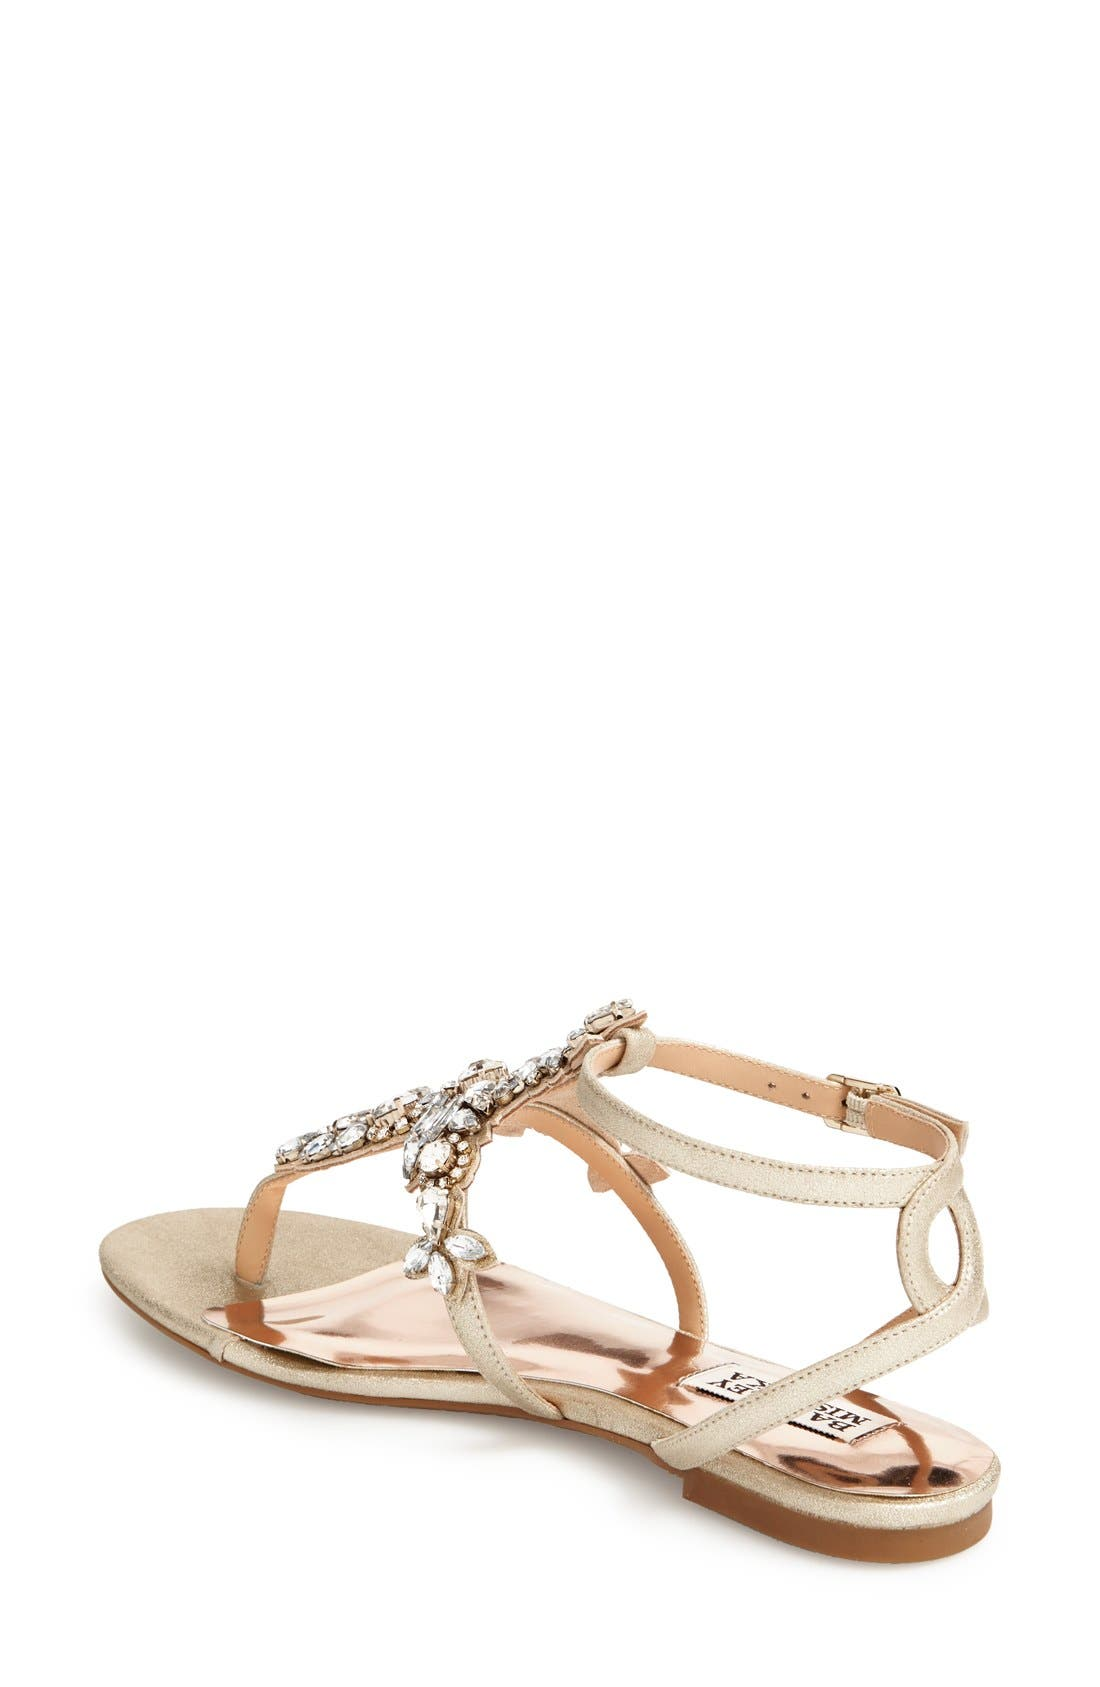 Badgley Mischka 'Cara' Crystal Embellished Flat Sandal,                             Alternate thumbnail 3, color,                             710